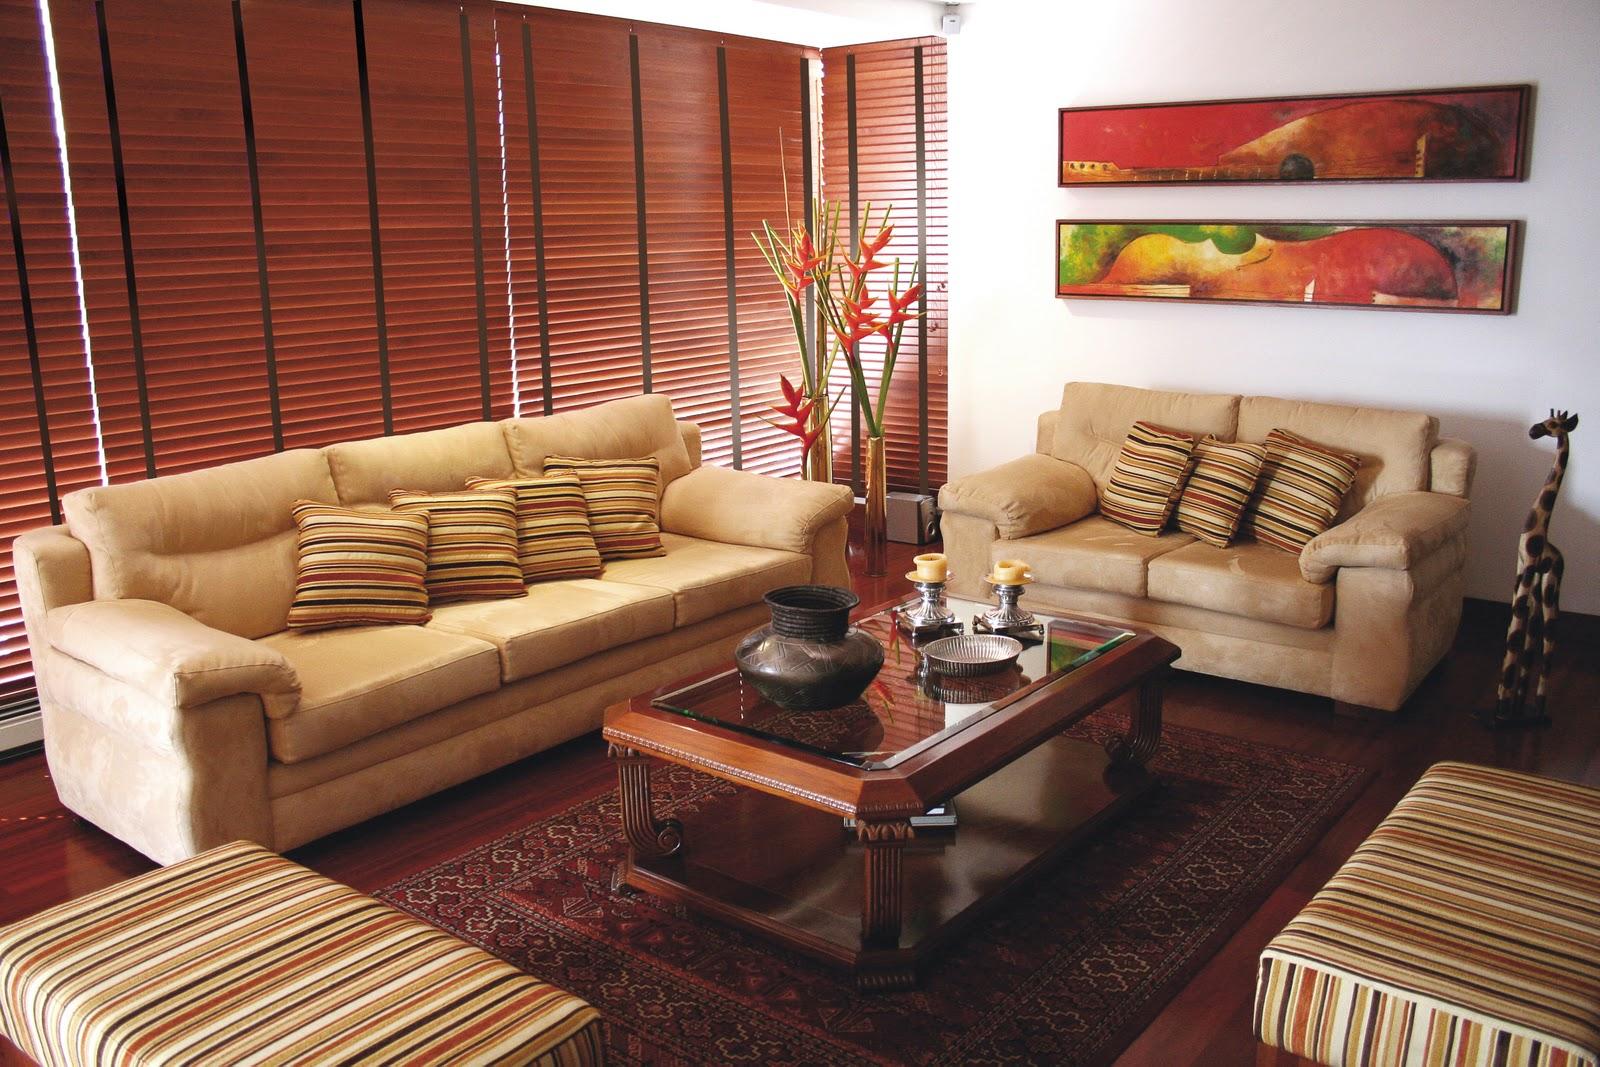 Espacios persianas persianas madera for Persianas madera